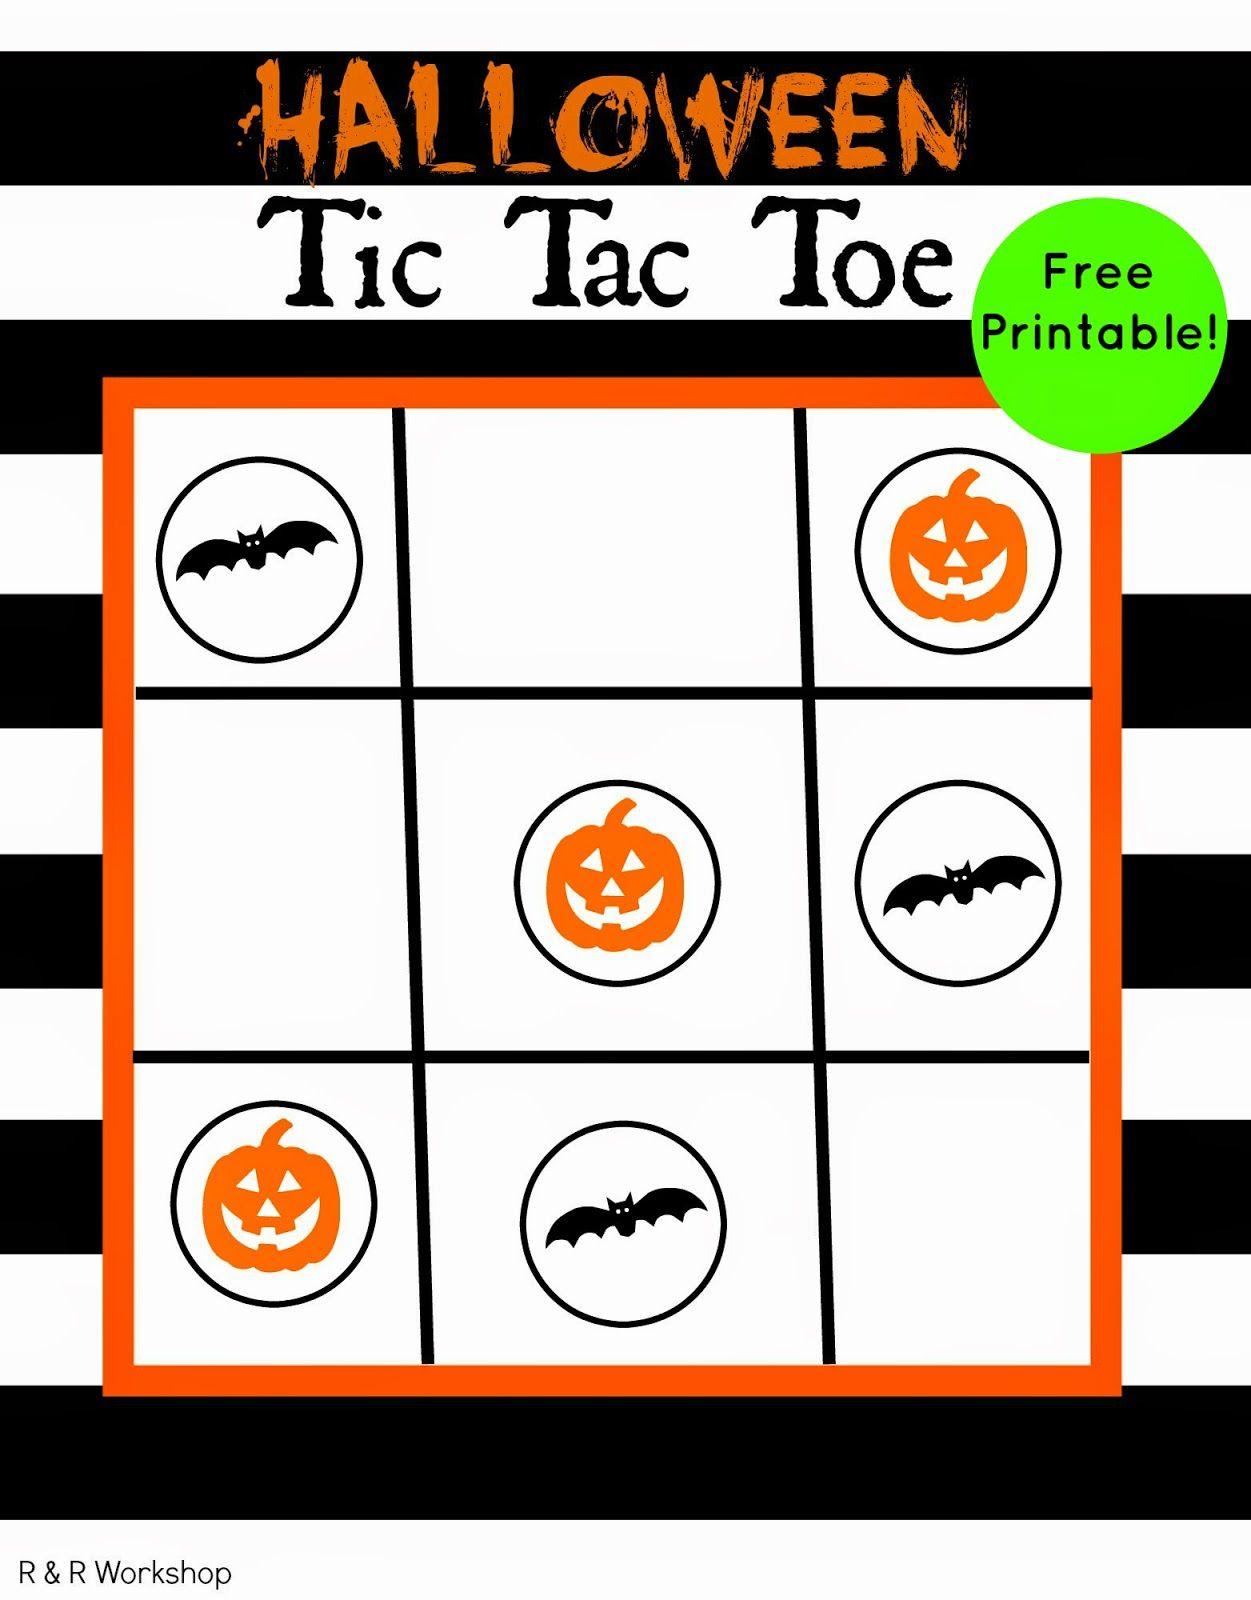 3ad274046 Halloween Tic Tac Toe Game (Free Printable)